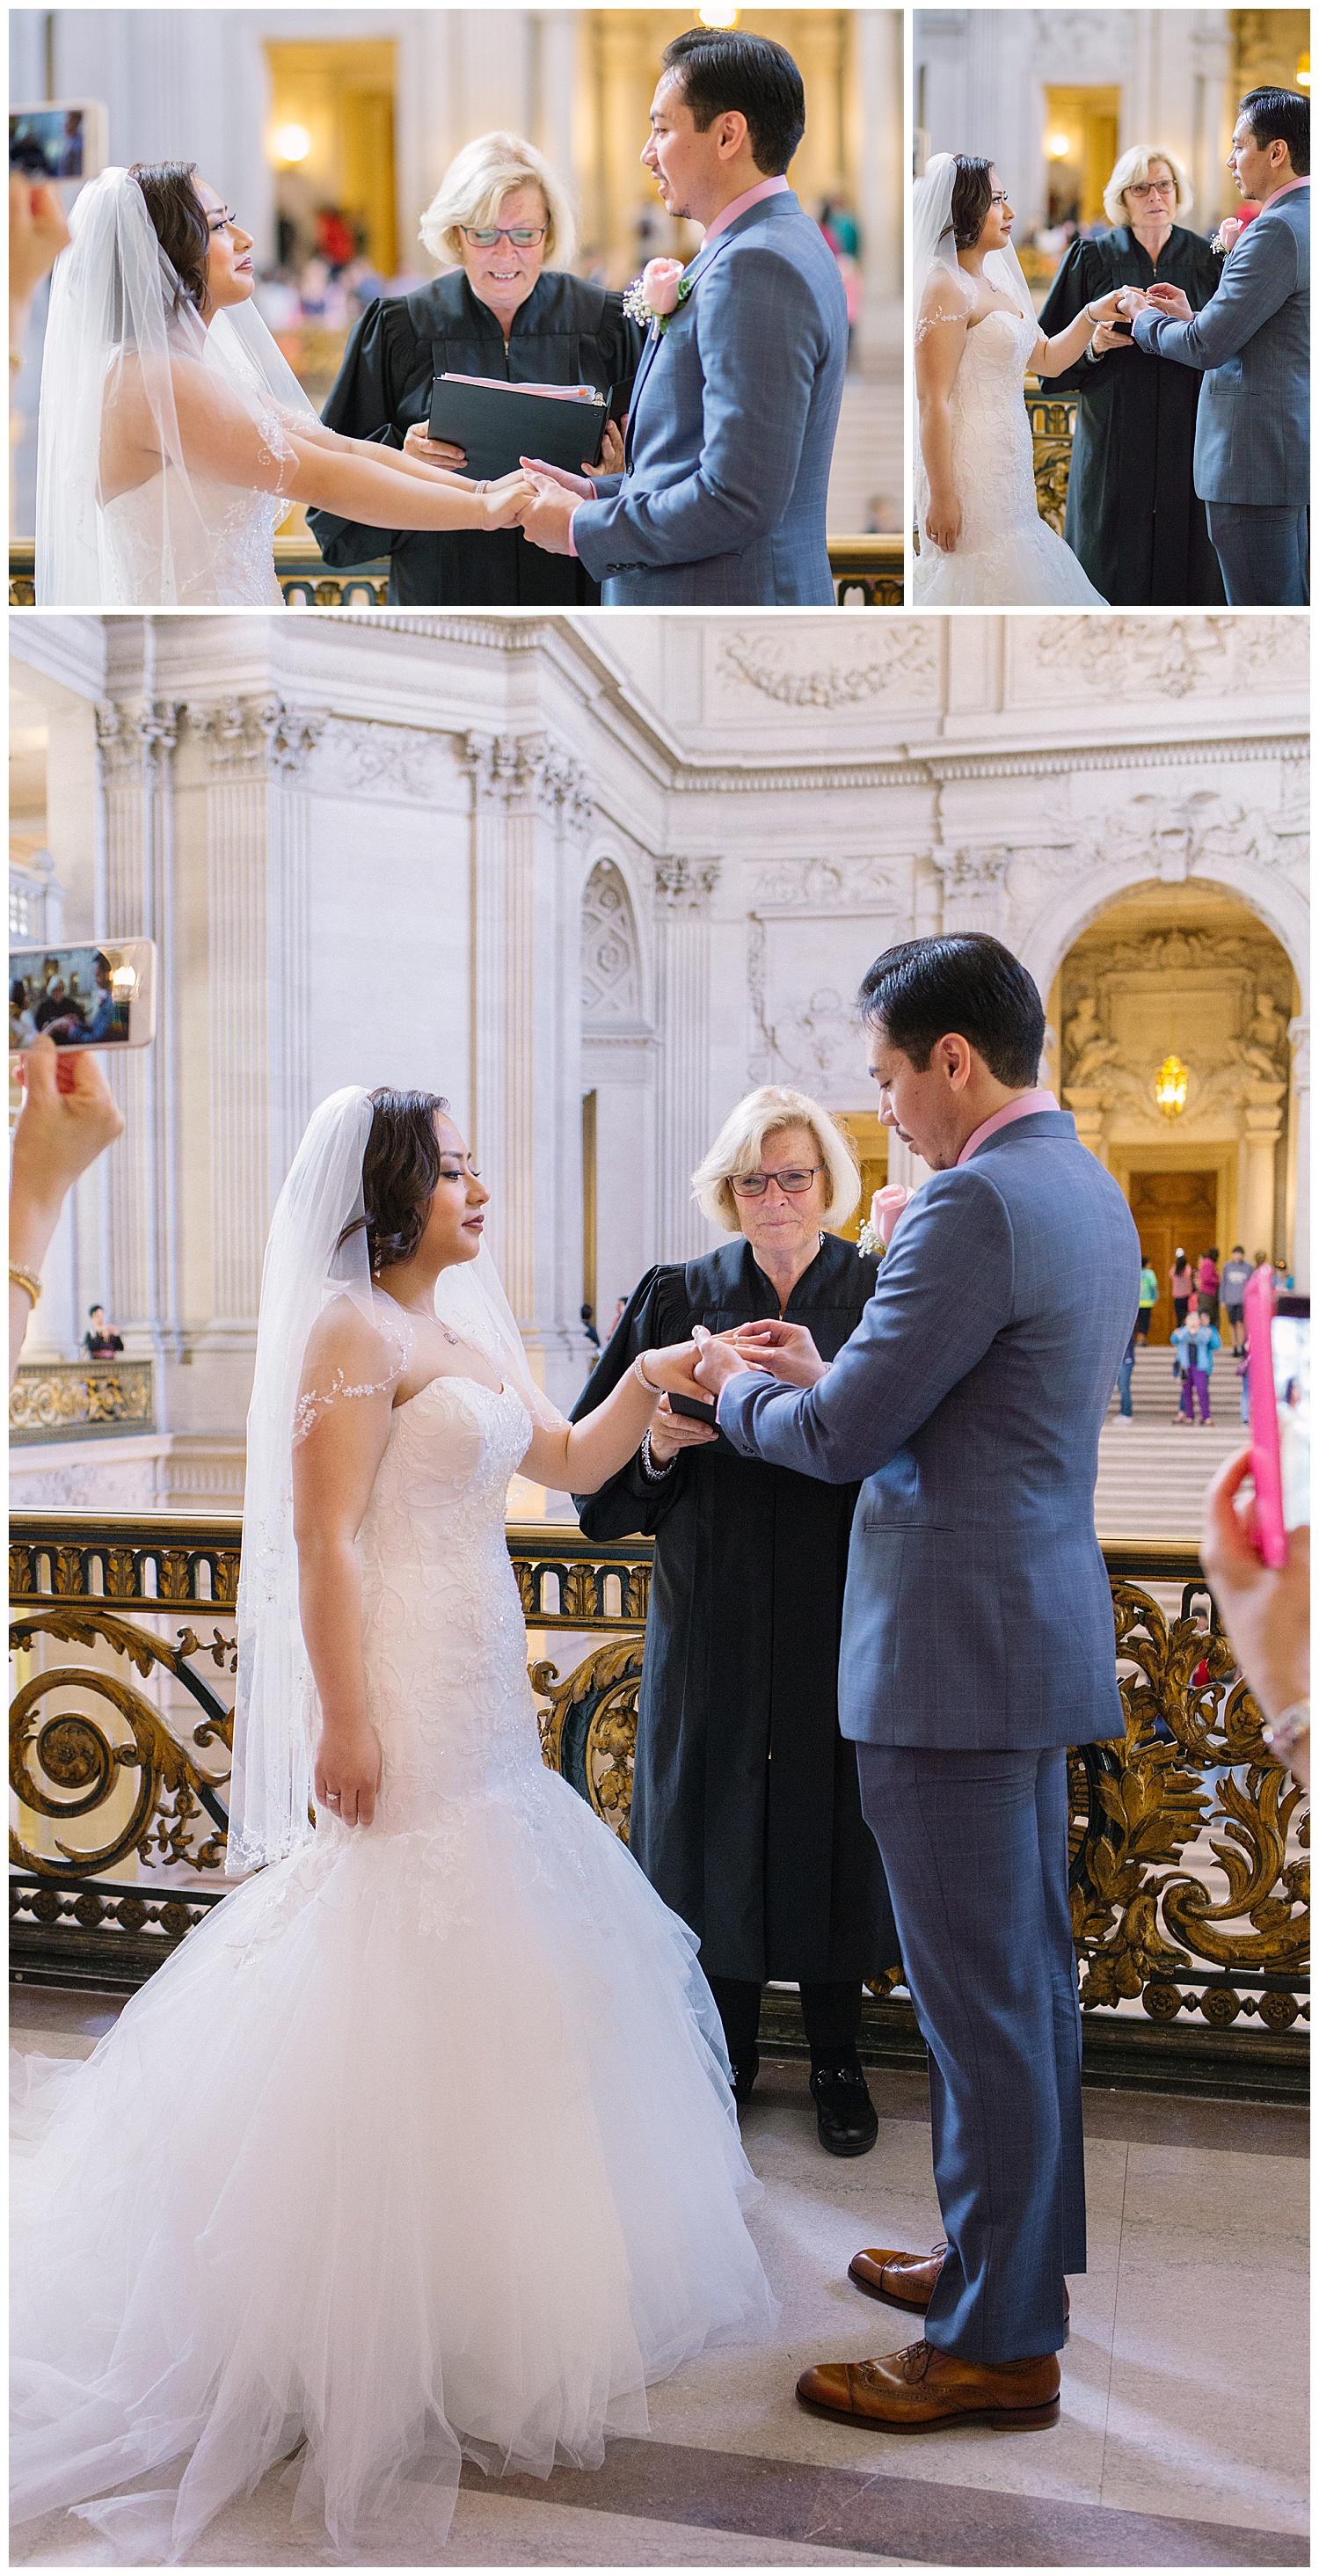 khariza-rae-photography-bay-area-wedding-photographer_0098.jpg